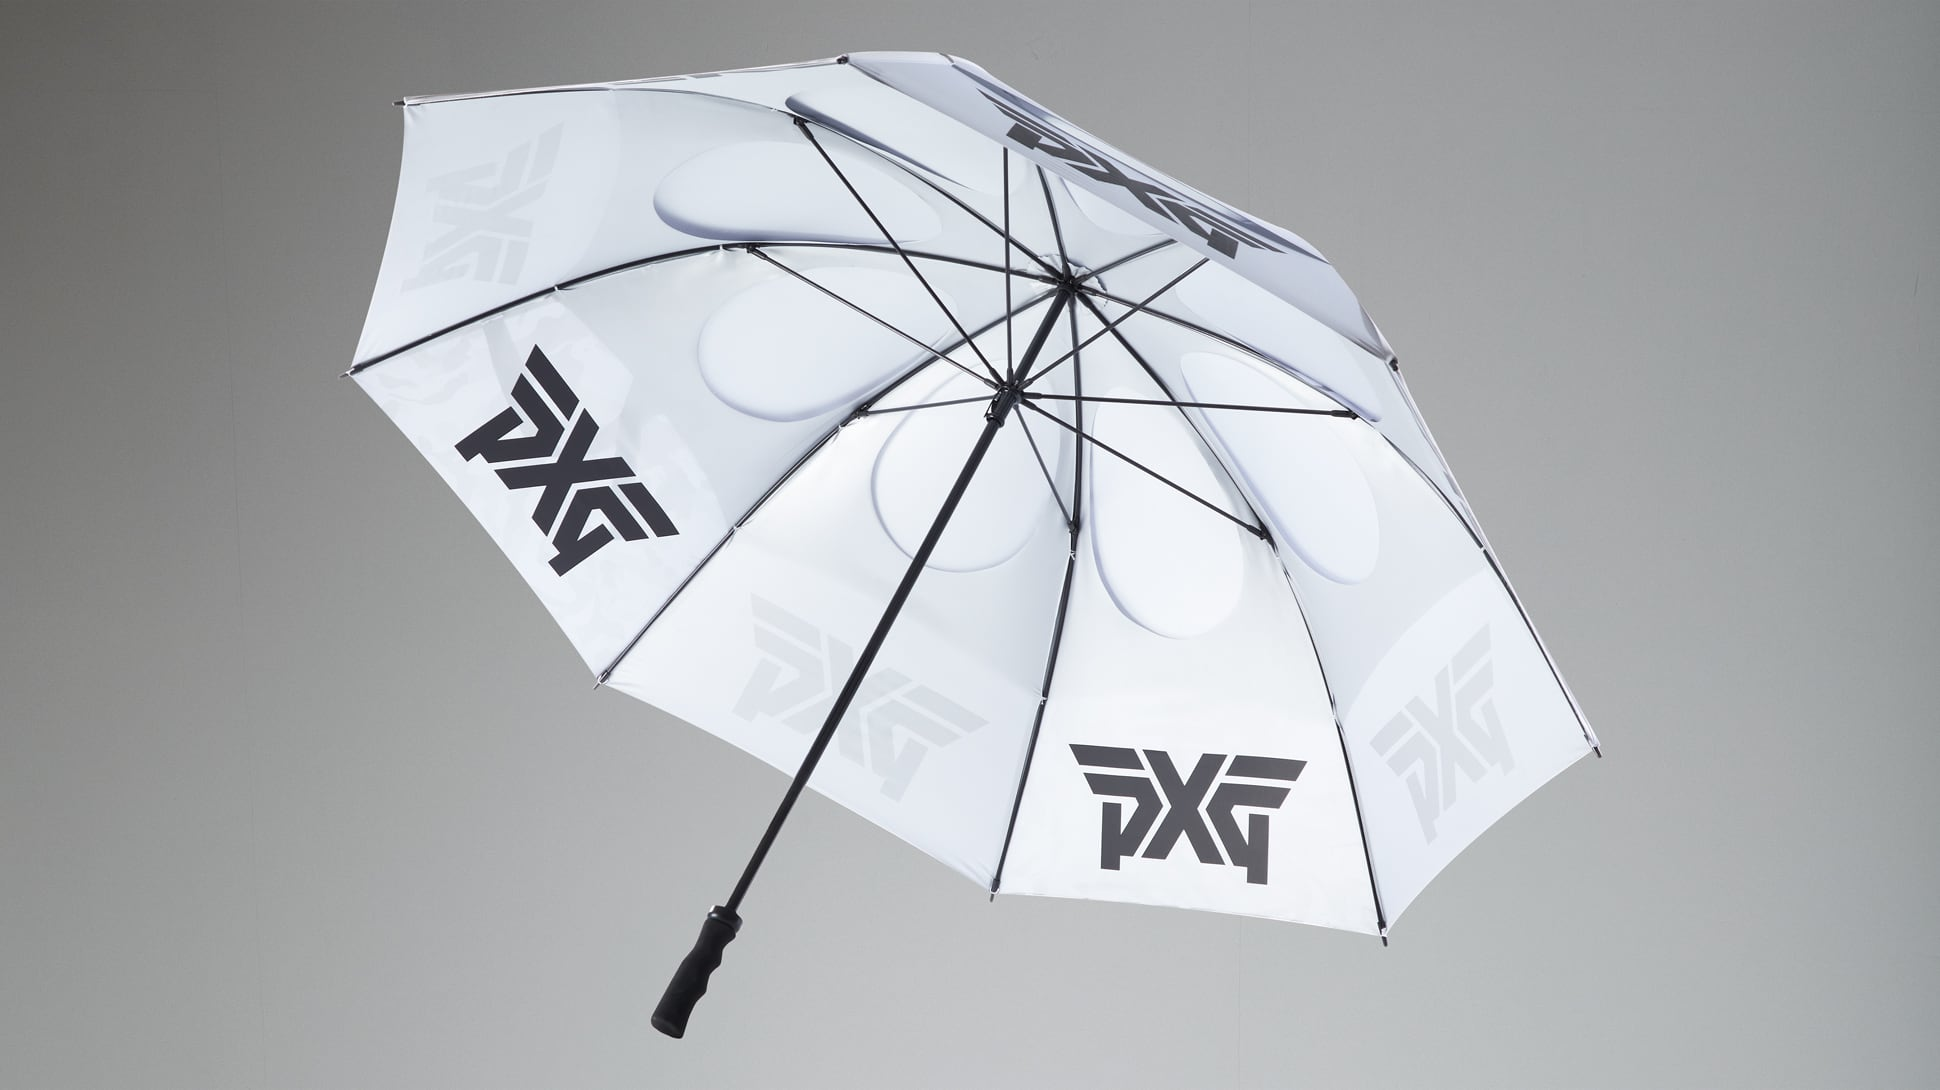 Dual Canopy Umbrella Image 2